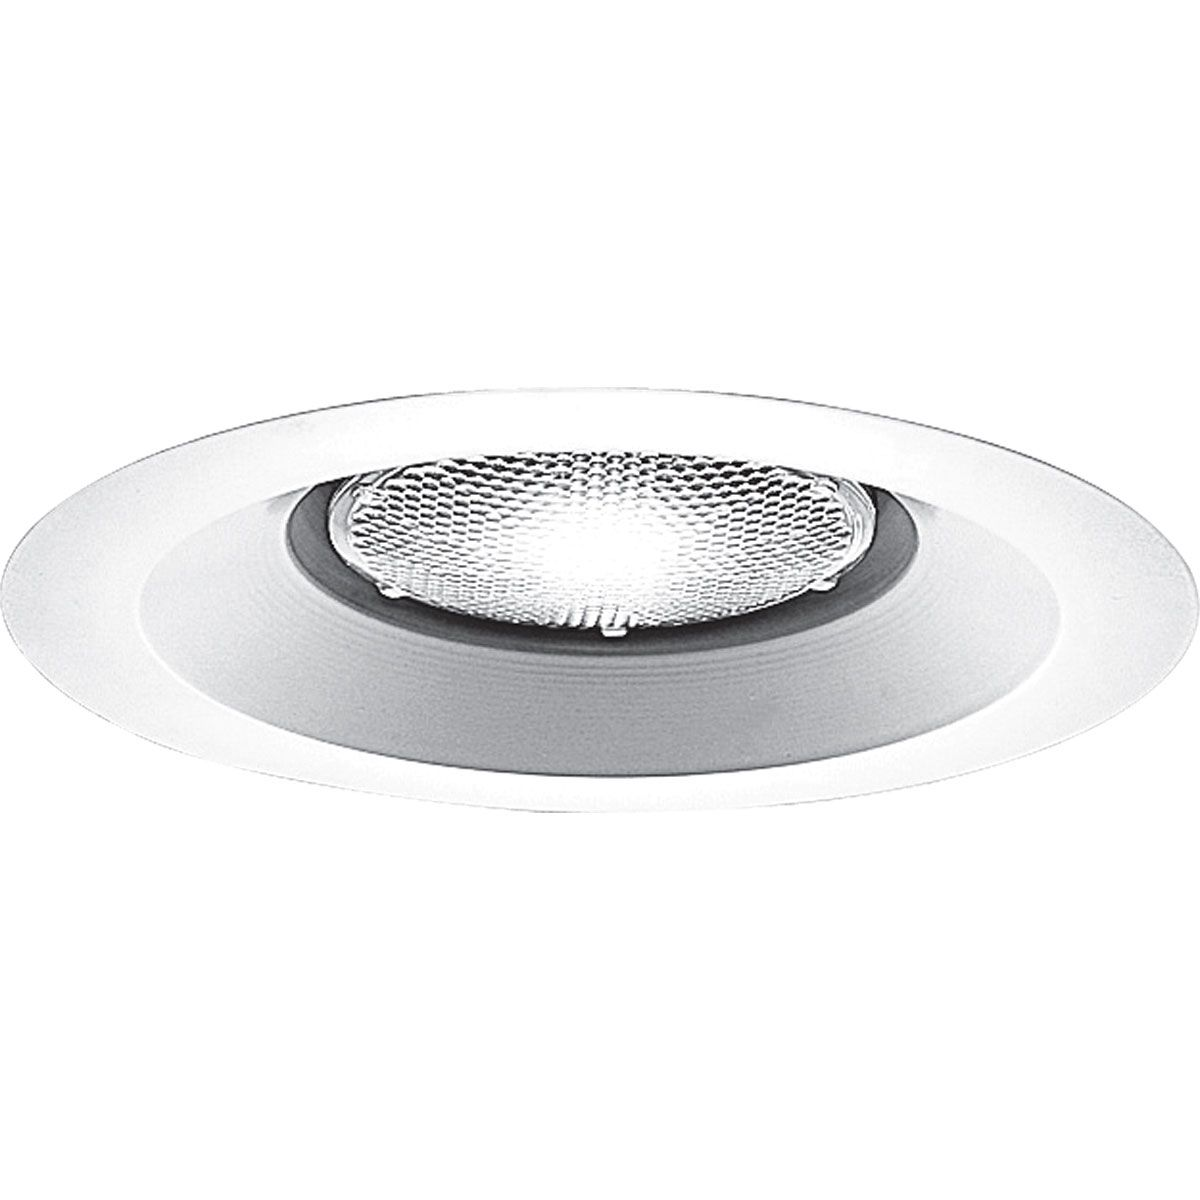 PROP8072WL-28 OPEN SHOWER TRIM WITH FLANGE; METAL FLANGE; WHITE; 6 INCH NOMINAL APERTURE SIZE; ROUND APERTURE SHAPE; PAR30 50 W INCANDESCENT LAMP; APPLICATION DAMP/WET LOCATION; USED ON P87-AT/P187-TG SERIES, PROGRESS